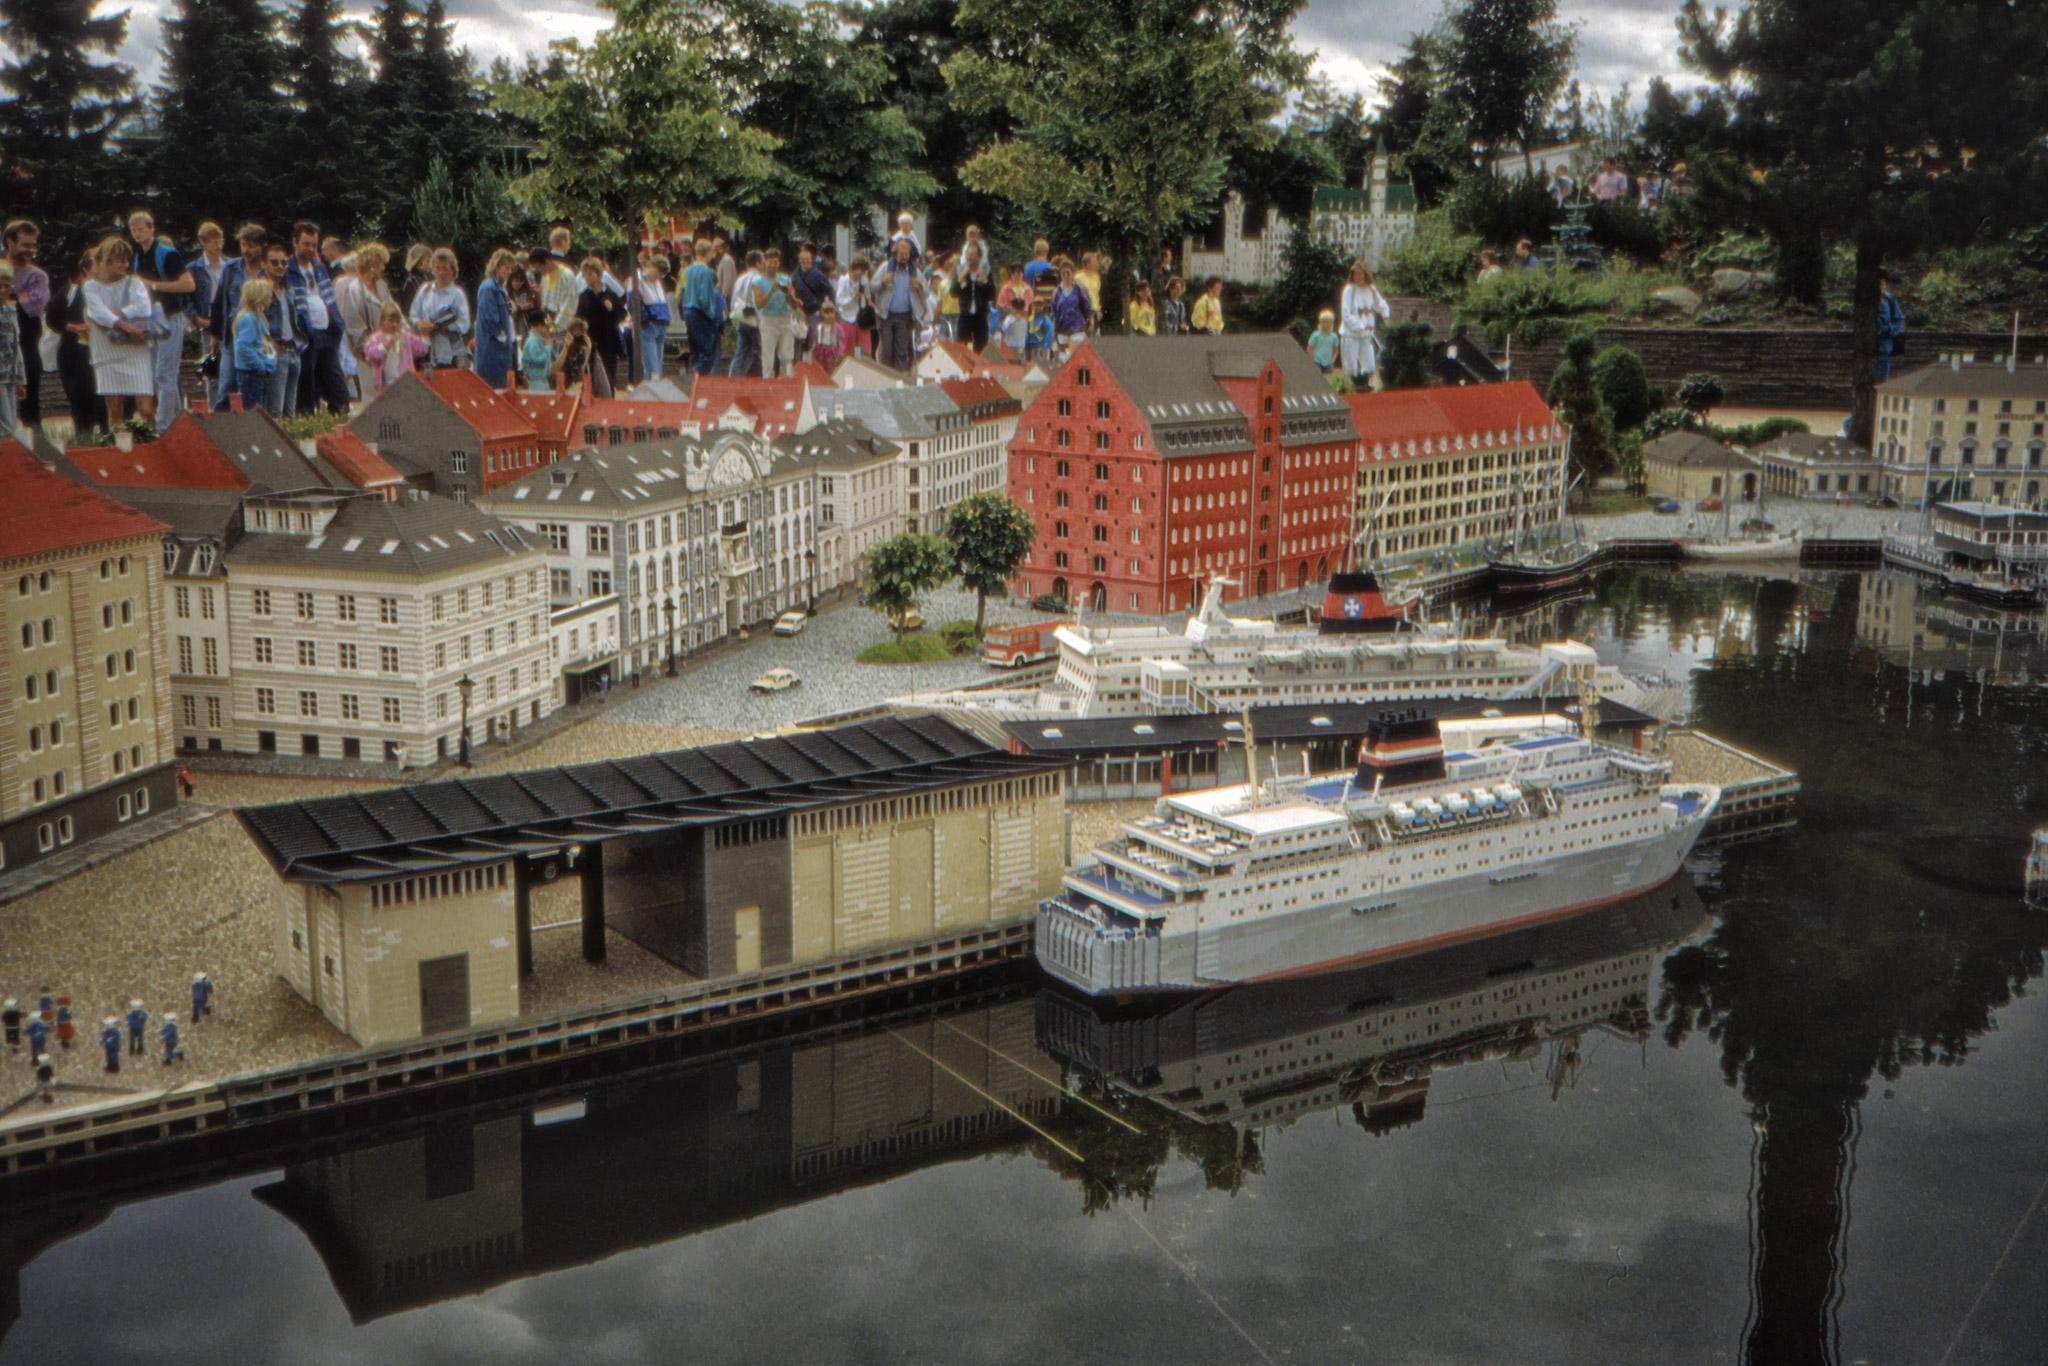 Hamnen i Legoland.